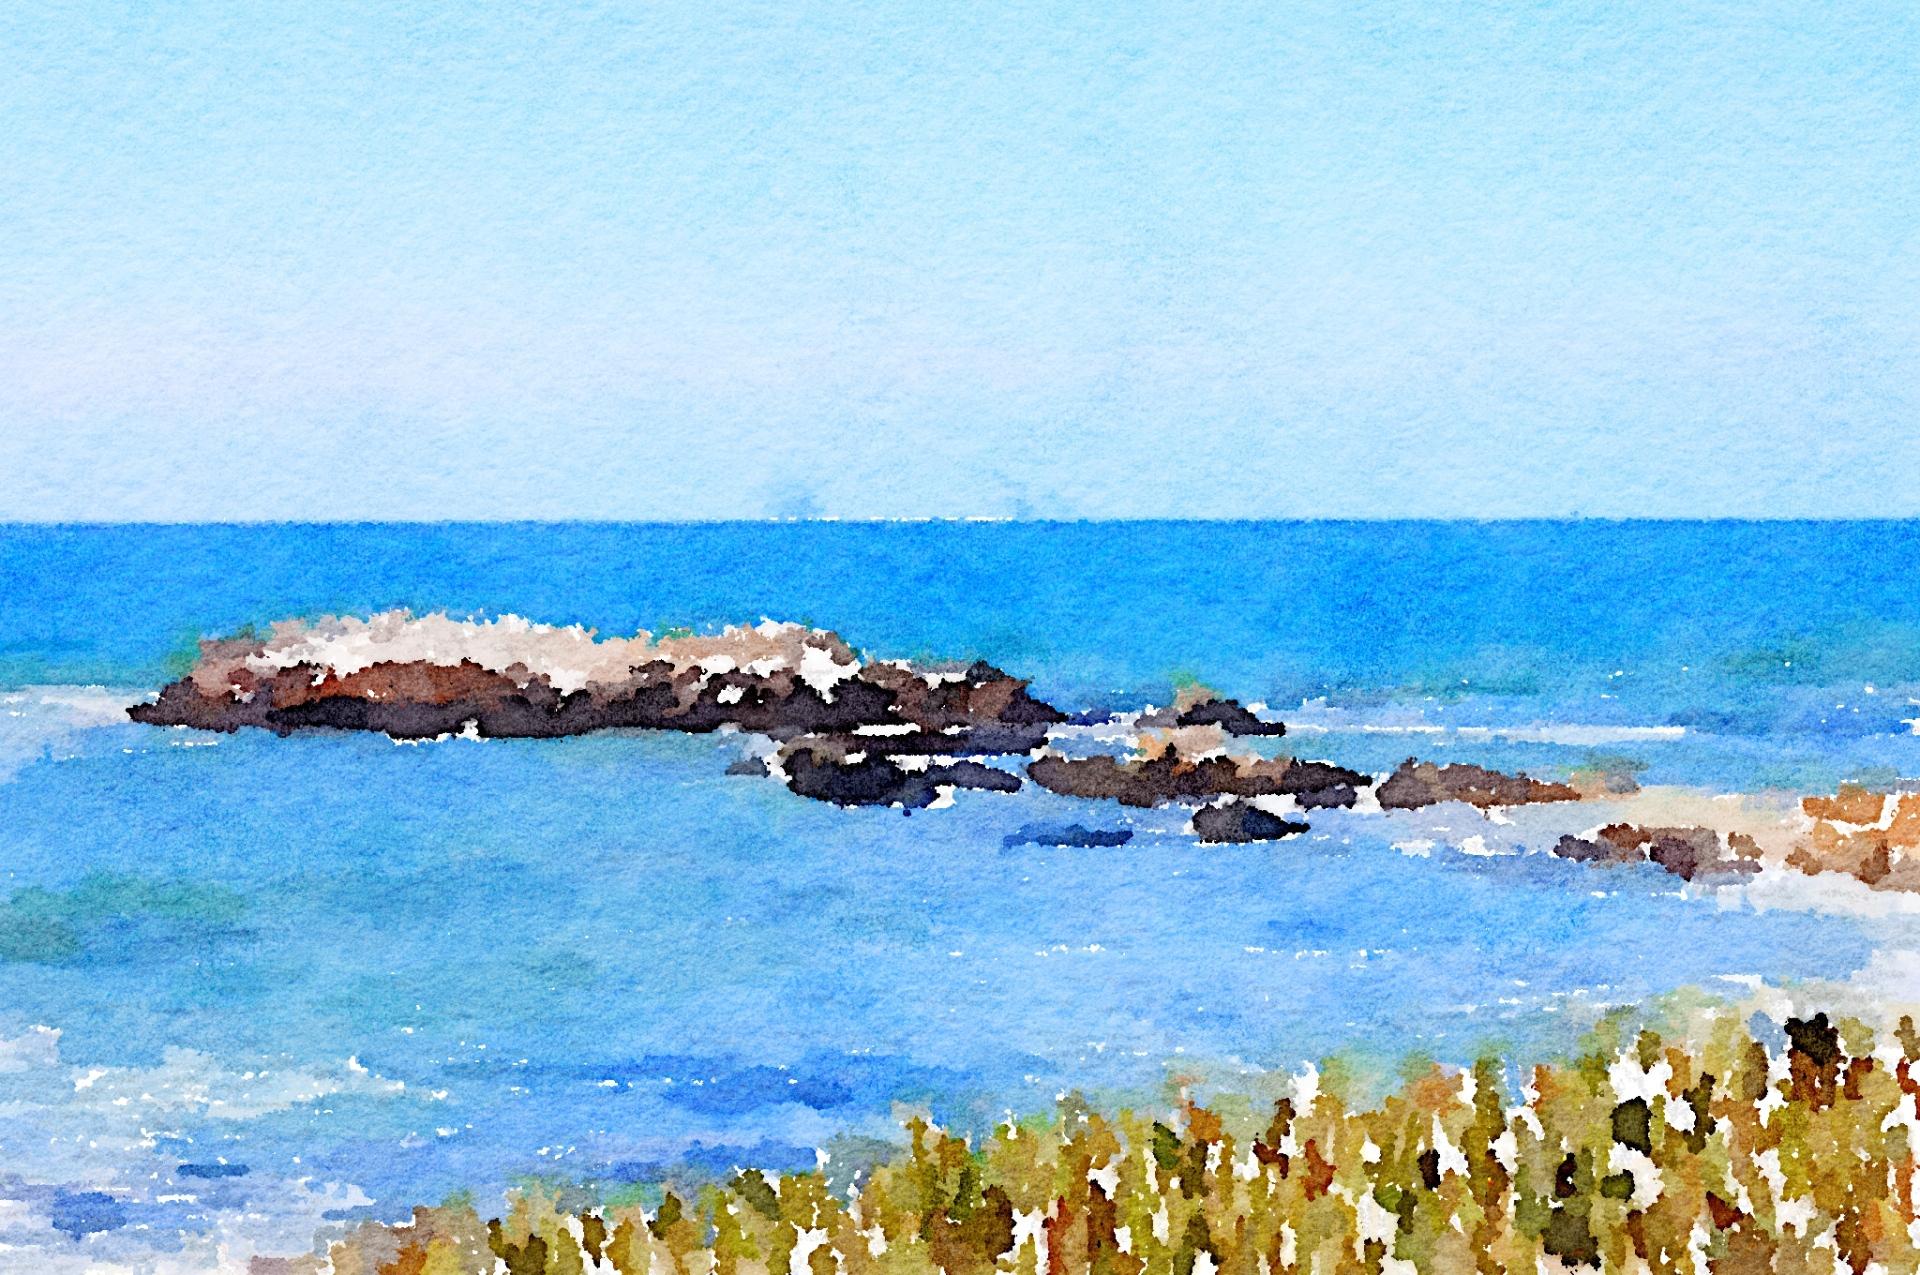 view-from-pescadaro-beach-waterlogue